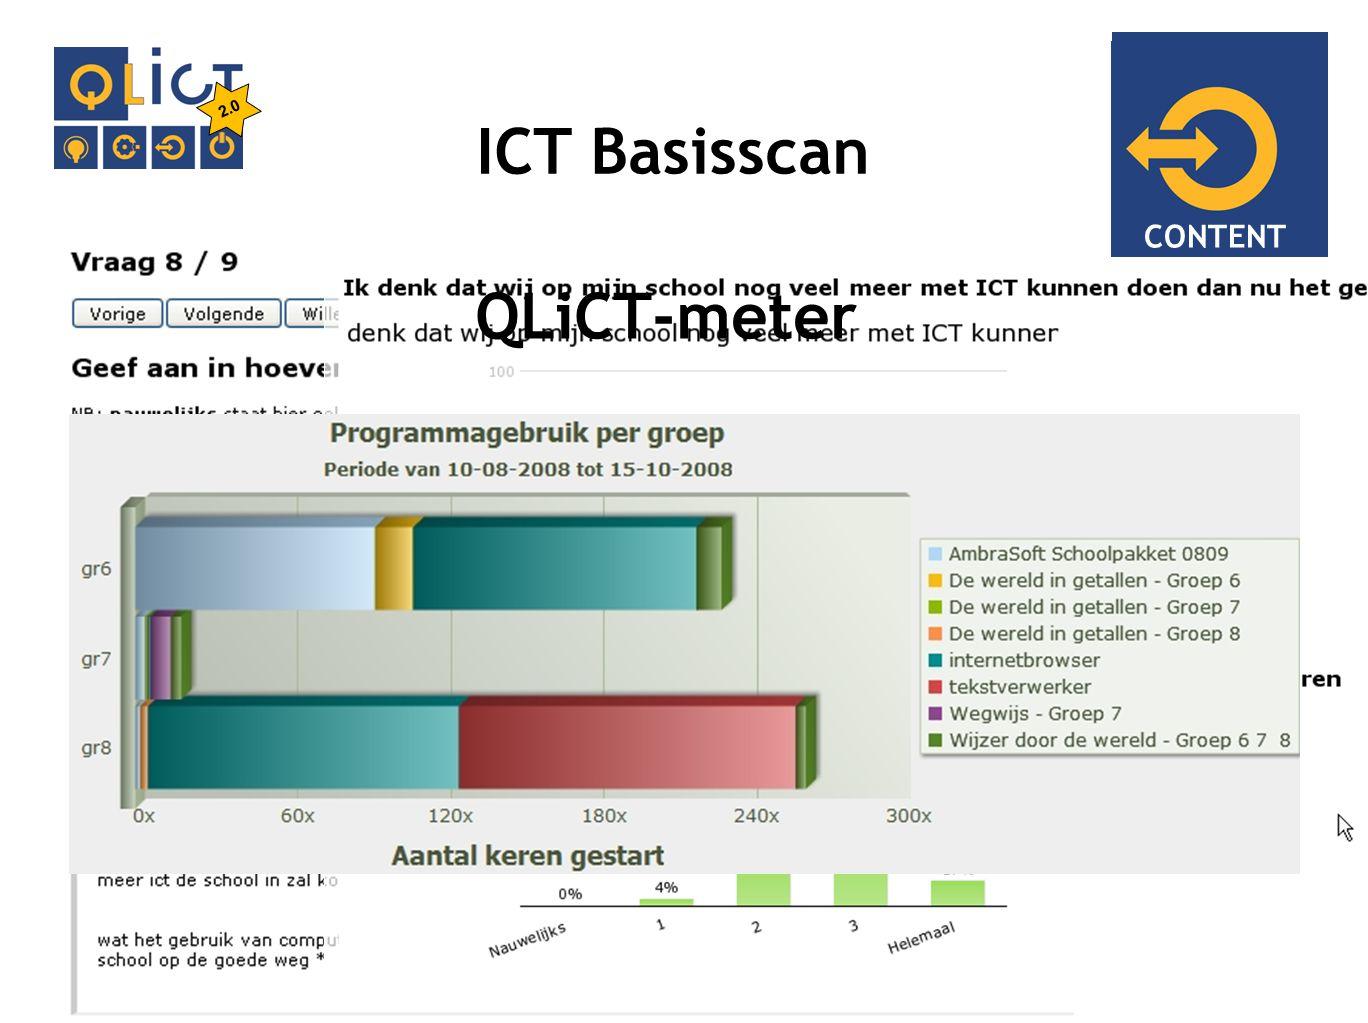 CONTENT QLiCT-meter 2.0